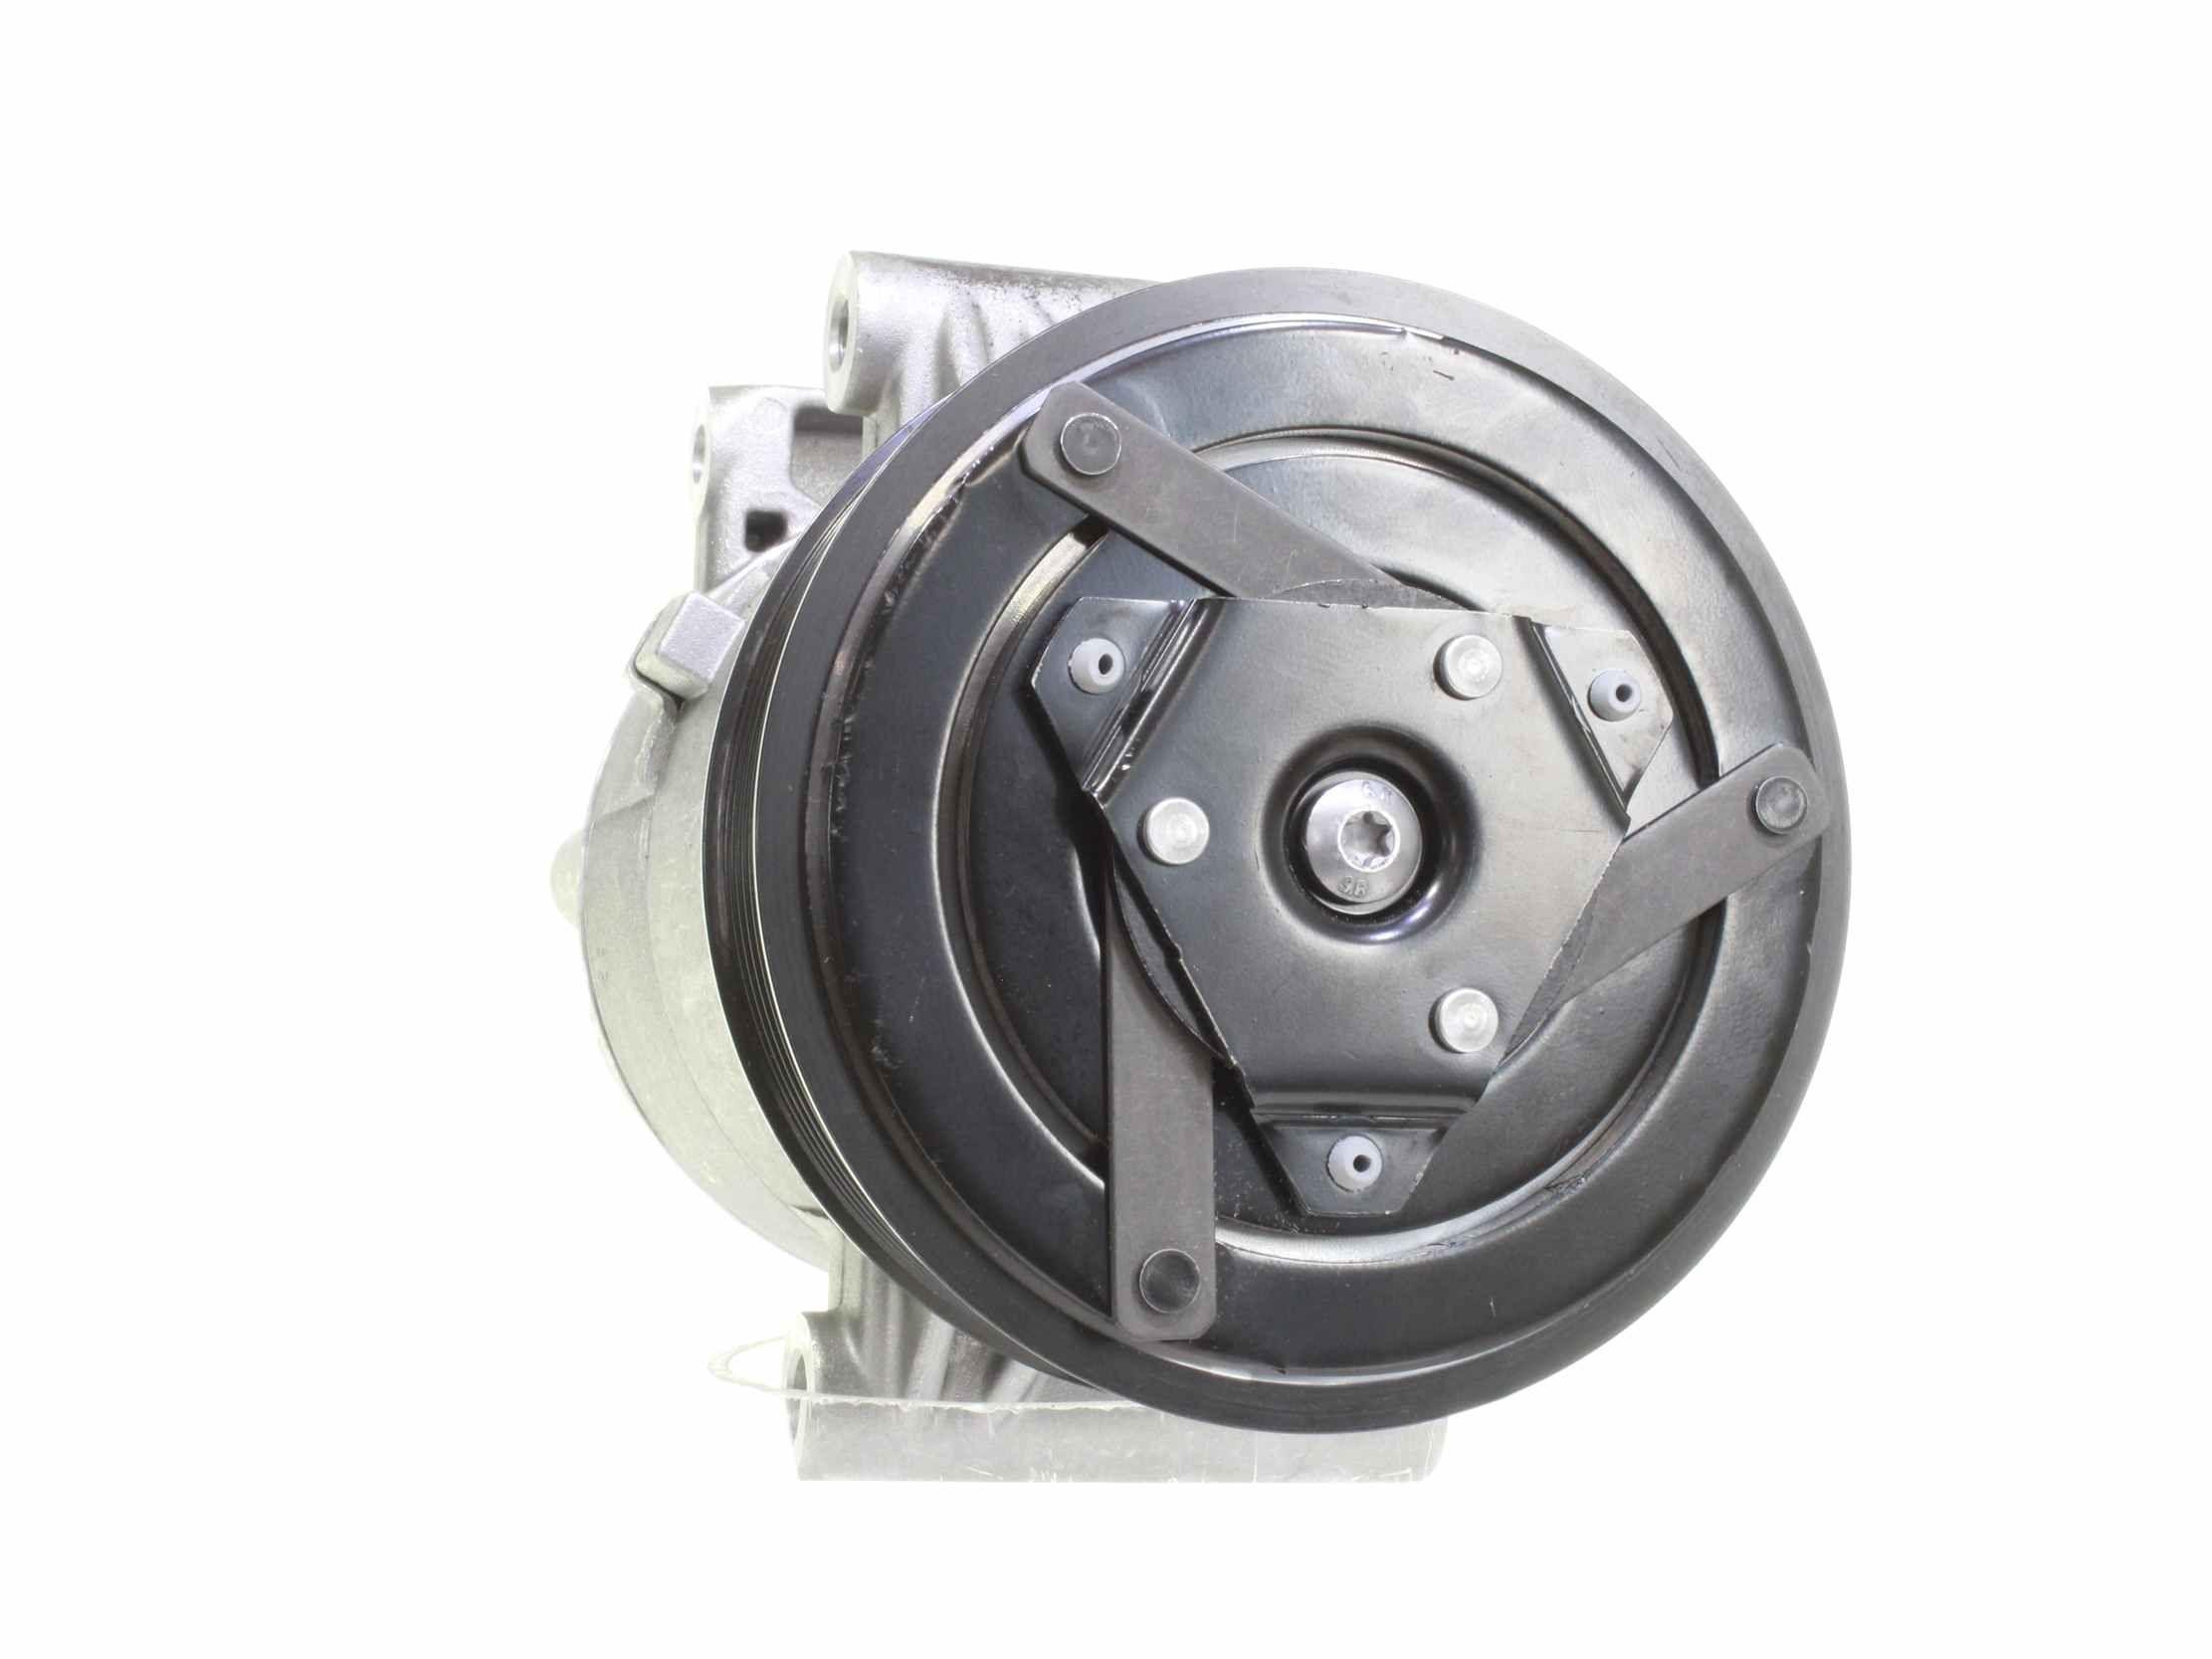 10550404 Klimaanlage Kompressor ALANKO - Markenprodukte billig